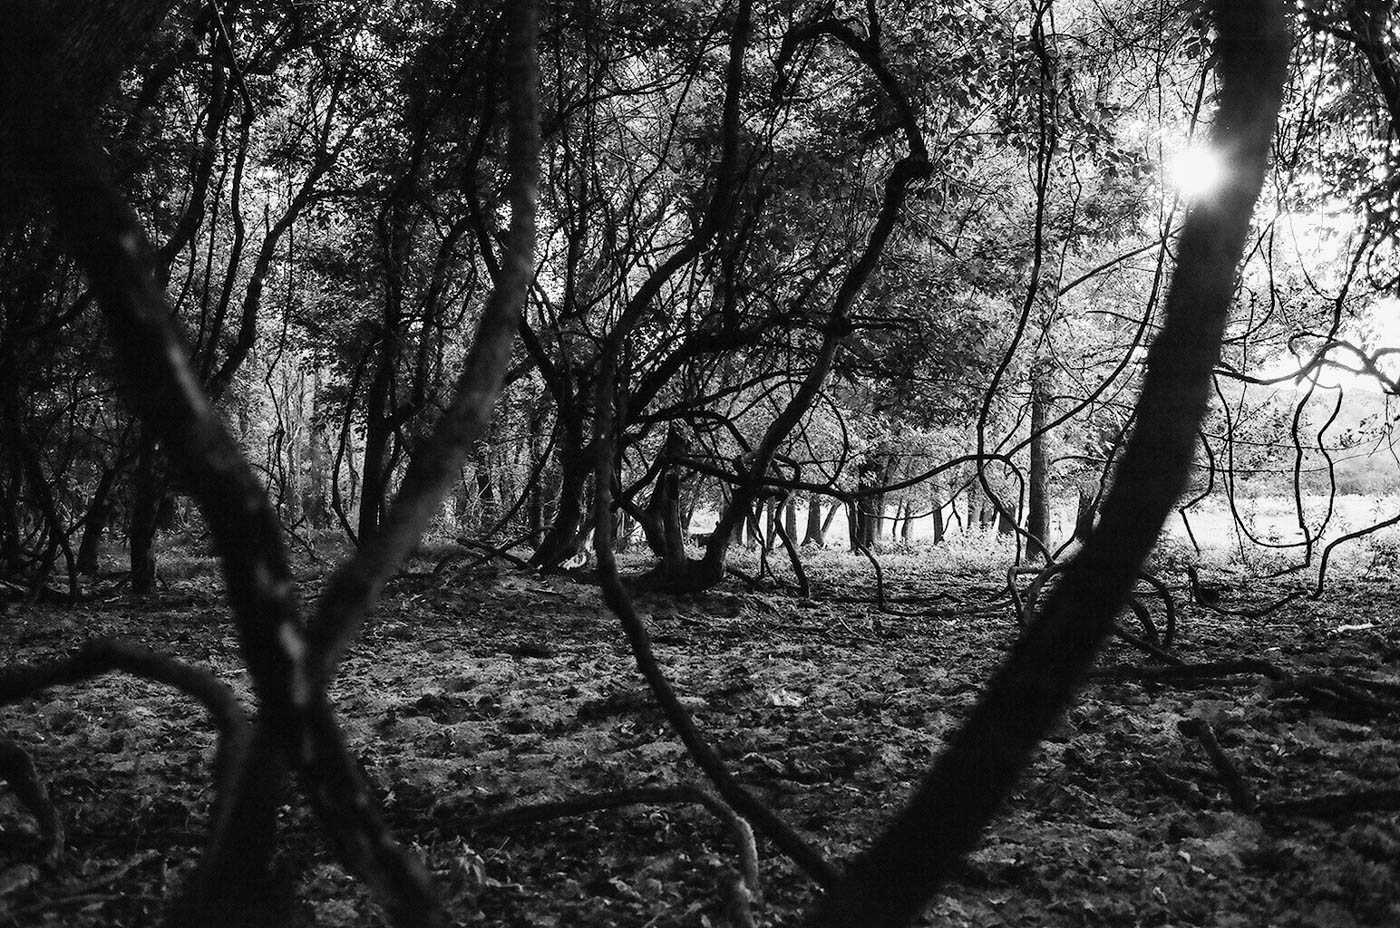 fujifilm-neopan-acros-100-plus-2-krista-michaels-photography-10.jpg